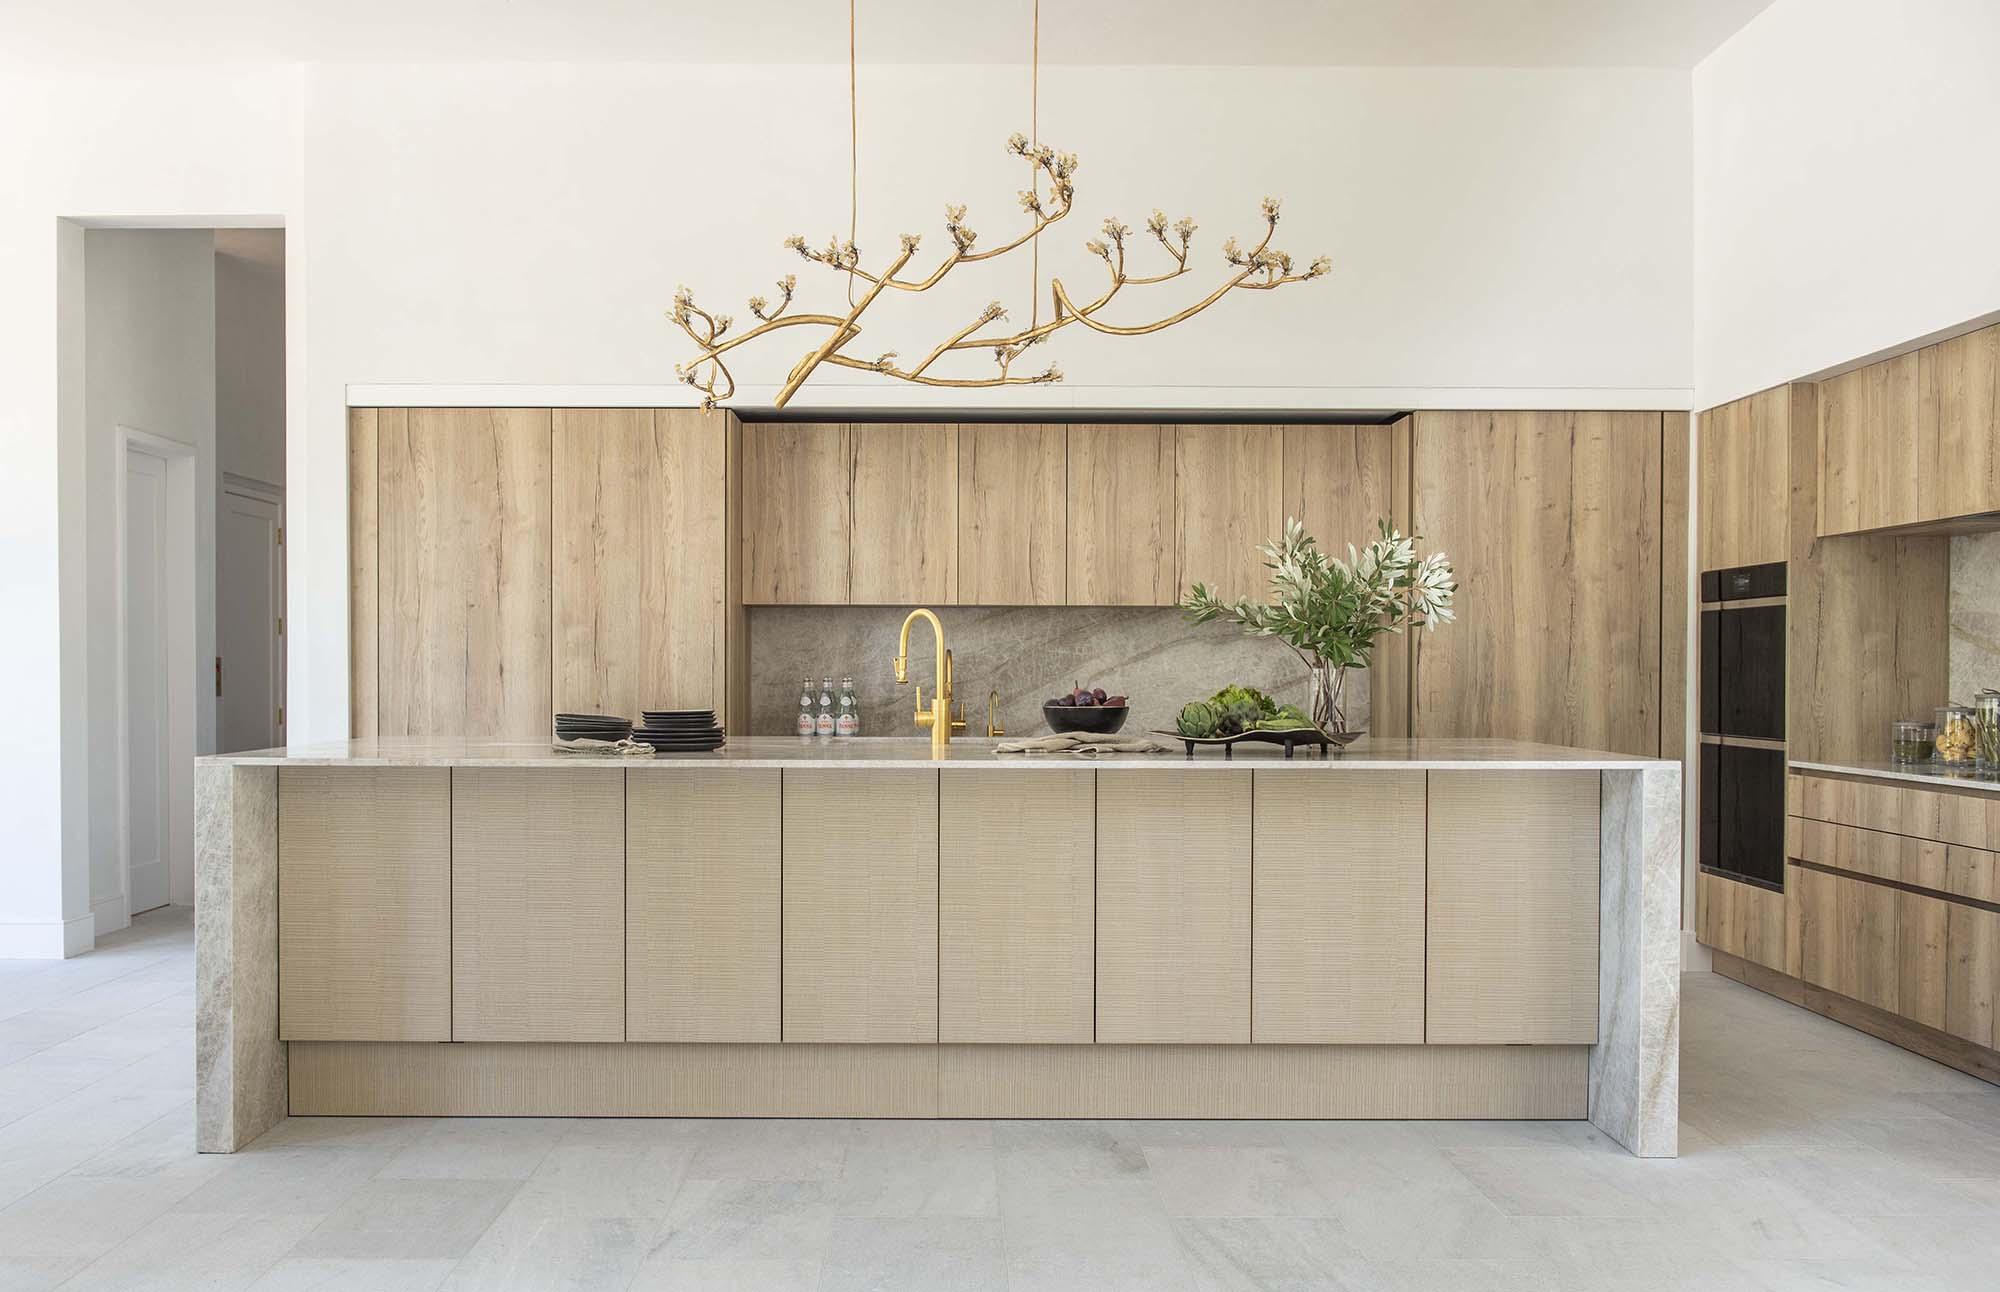 Elegant, Timeless Kitchen in Bunker Hill Village